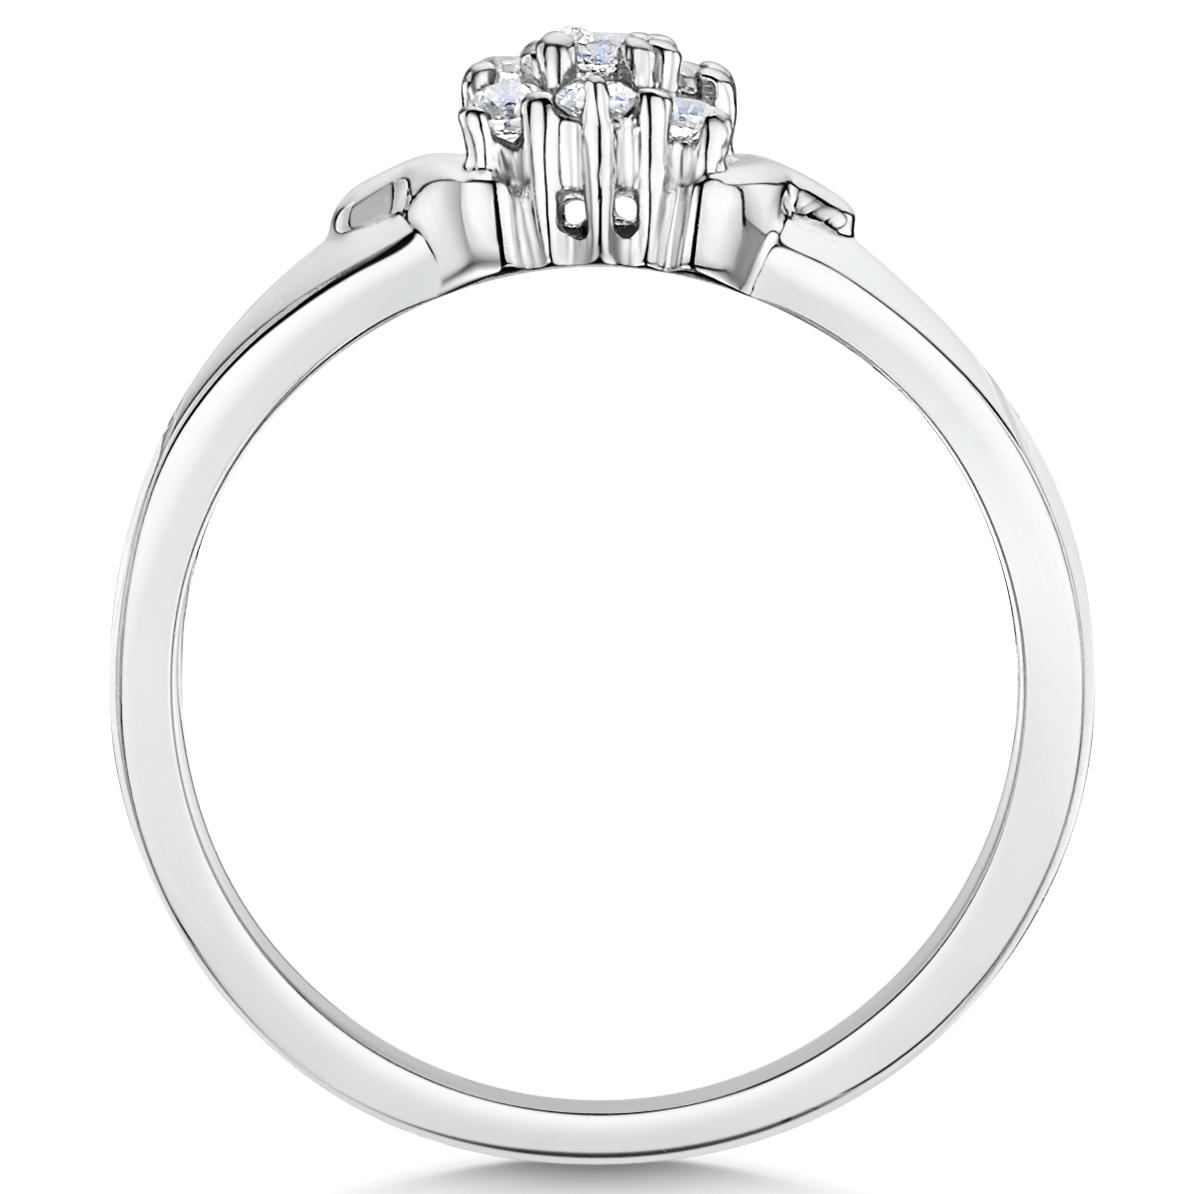 Cobalt 10 stone cluster engagement wedding ring